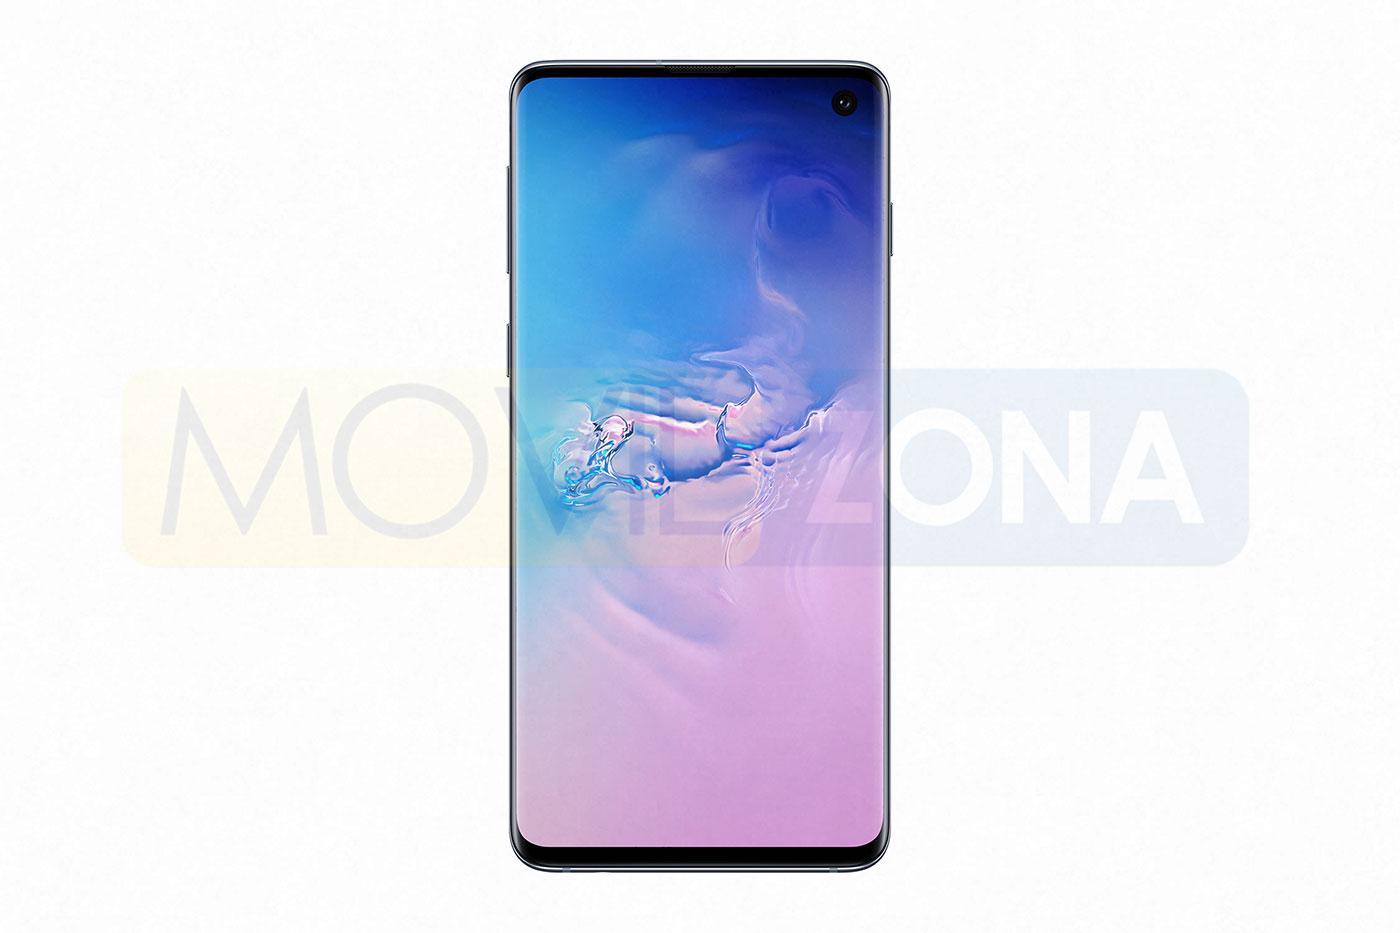 Samsung Galaxy S10 frontal